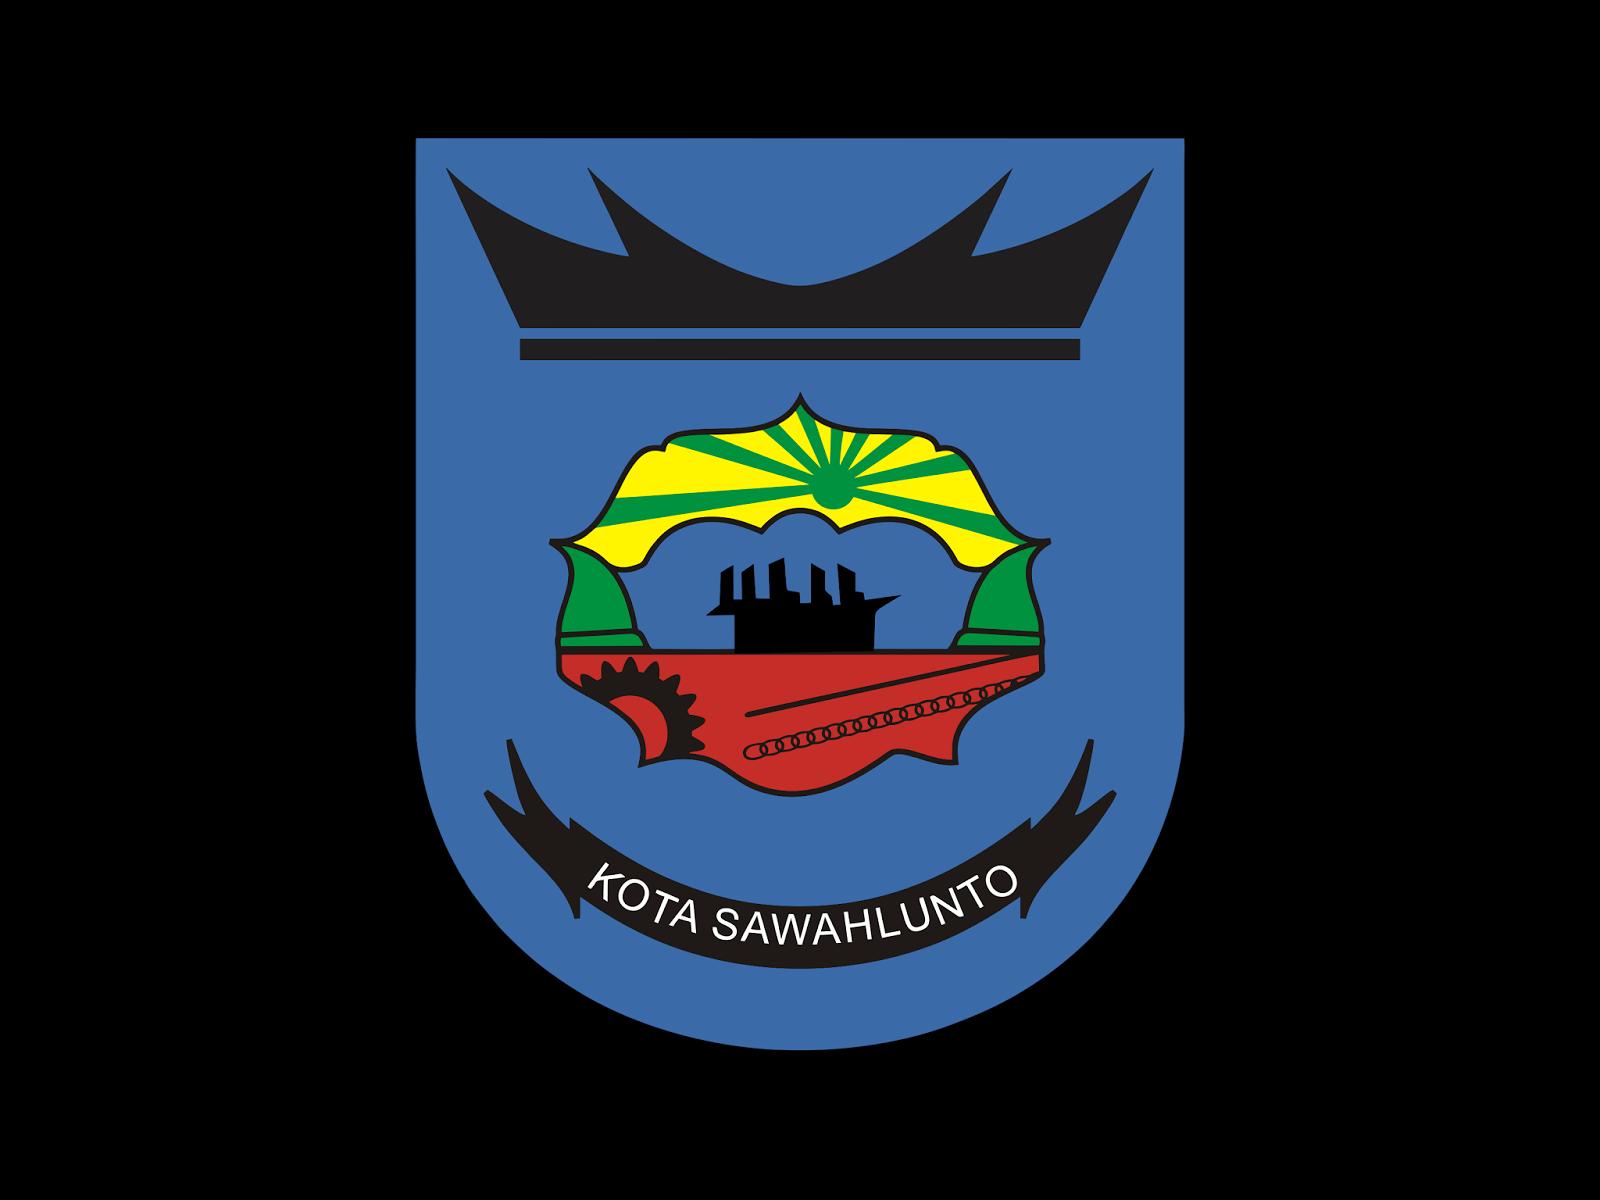 Logo Kota Sawhlunto Vector Cdr Png Hd Biologizone